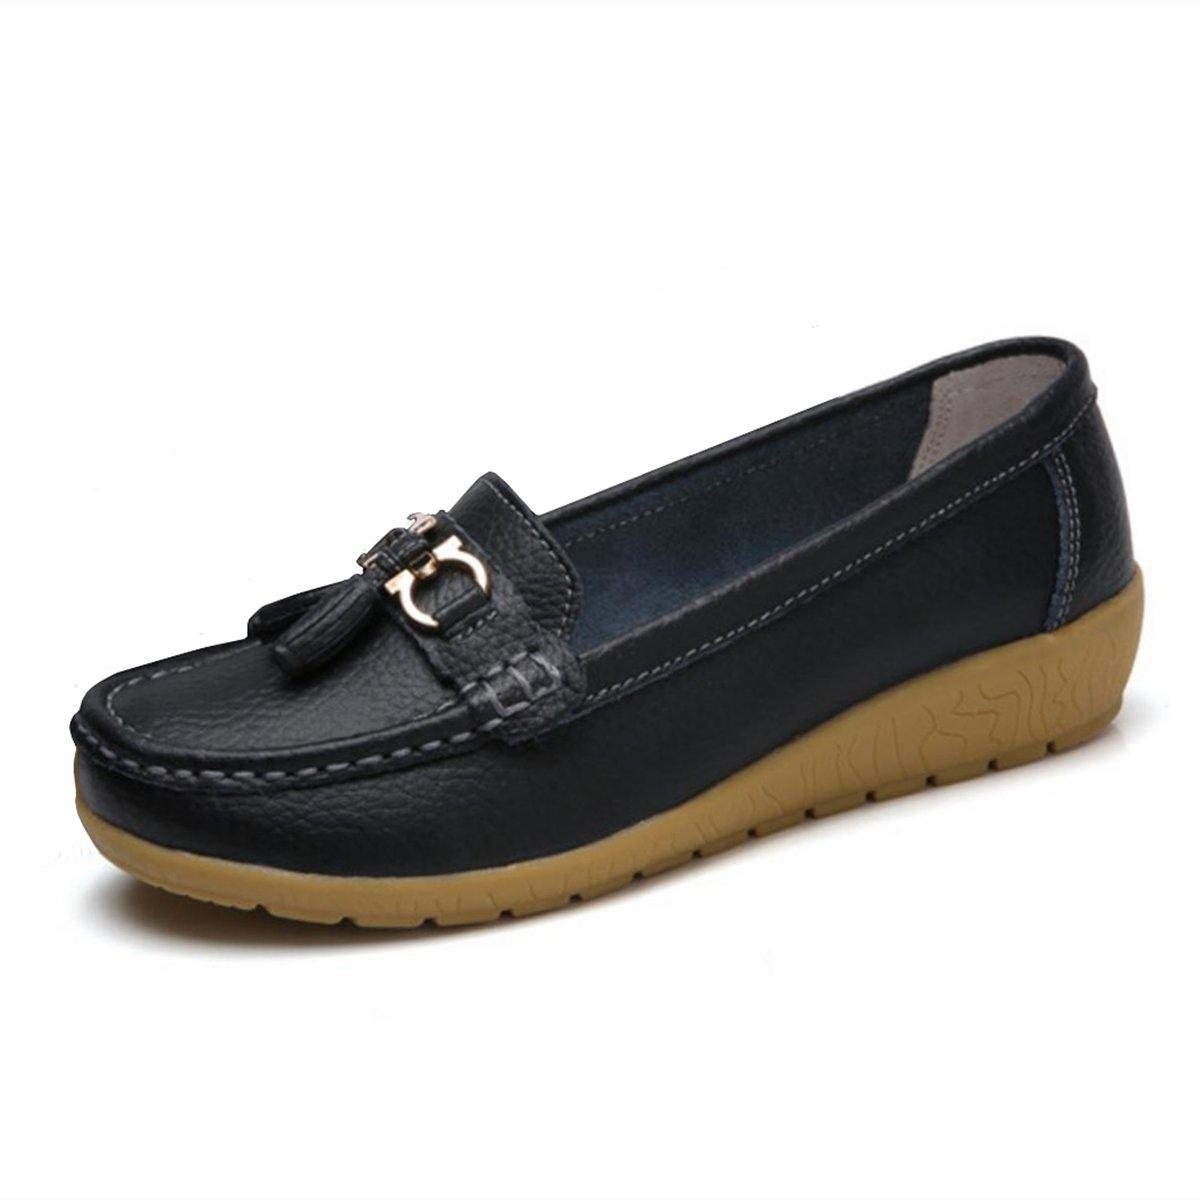 Women Loafers Leather Oxford Slip On Walking Flats Anti-Skid Boat Shoes (7 B (M) US, V-Black)